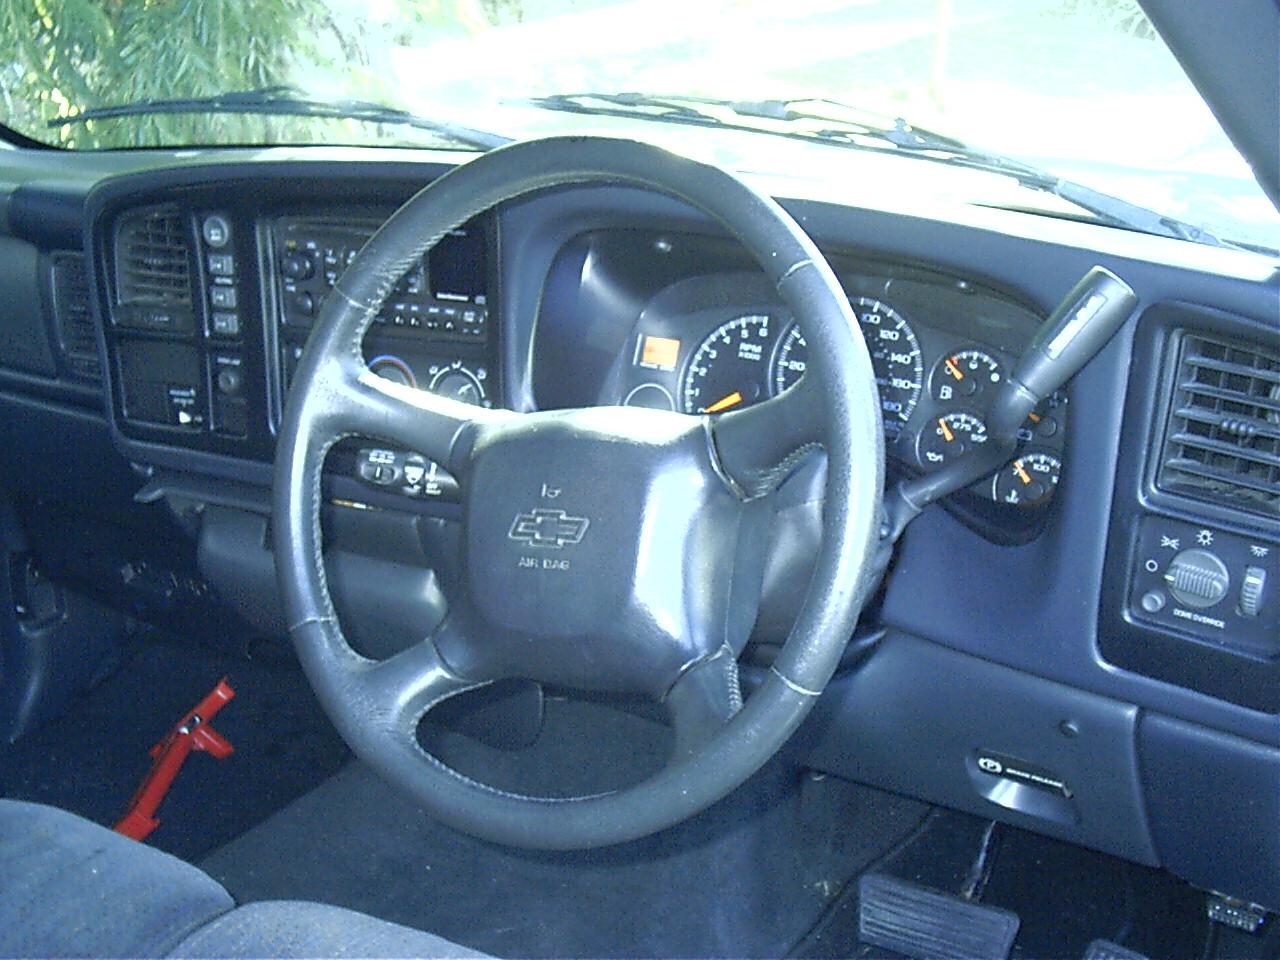 Picture of 2000 chevrolet tahoe limited z71 4wd interior - 2000 chevy silverado 1500 interior ...